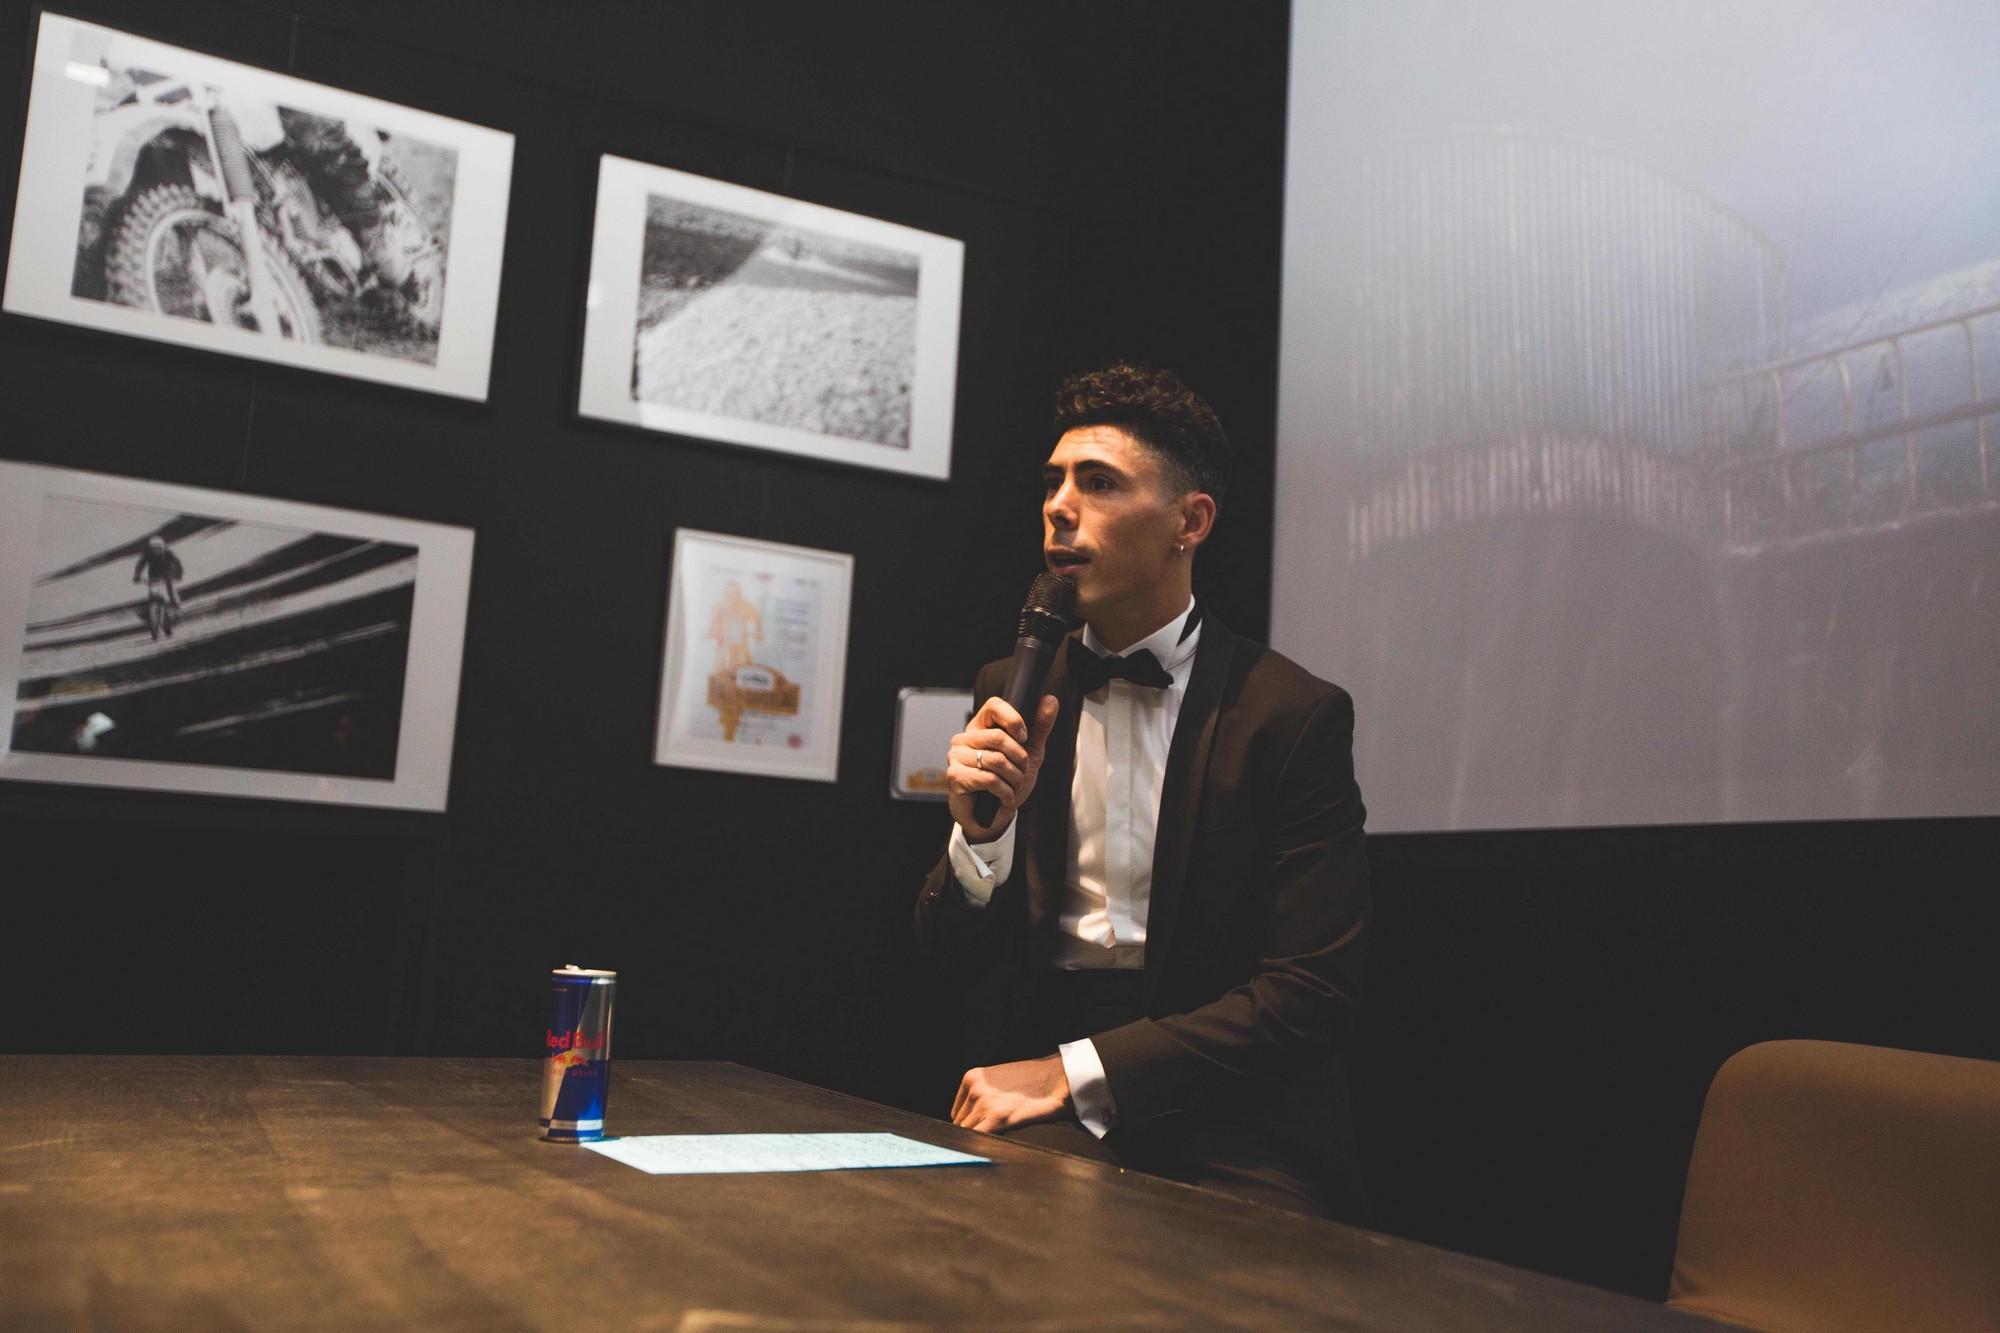 Marco Aurelio Fontana - My Vision